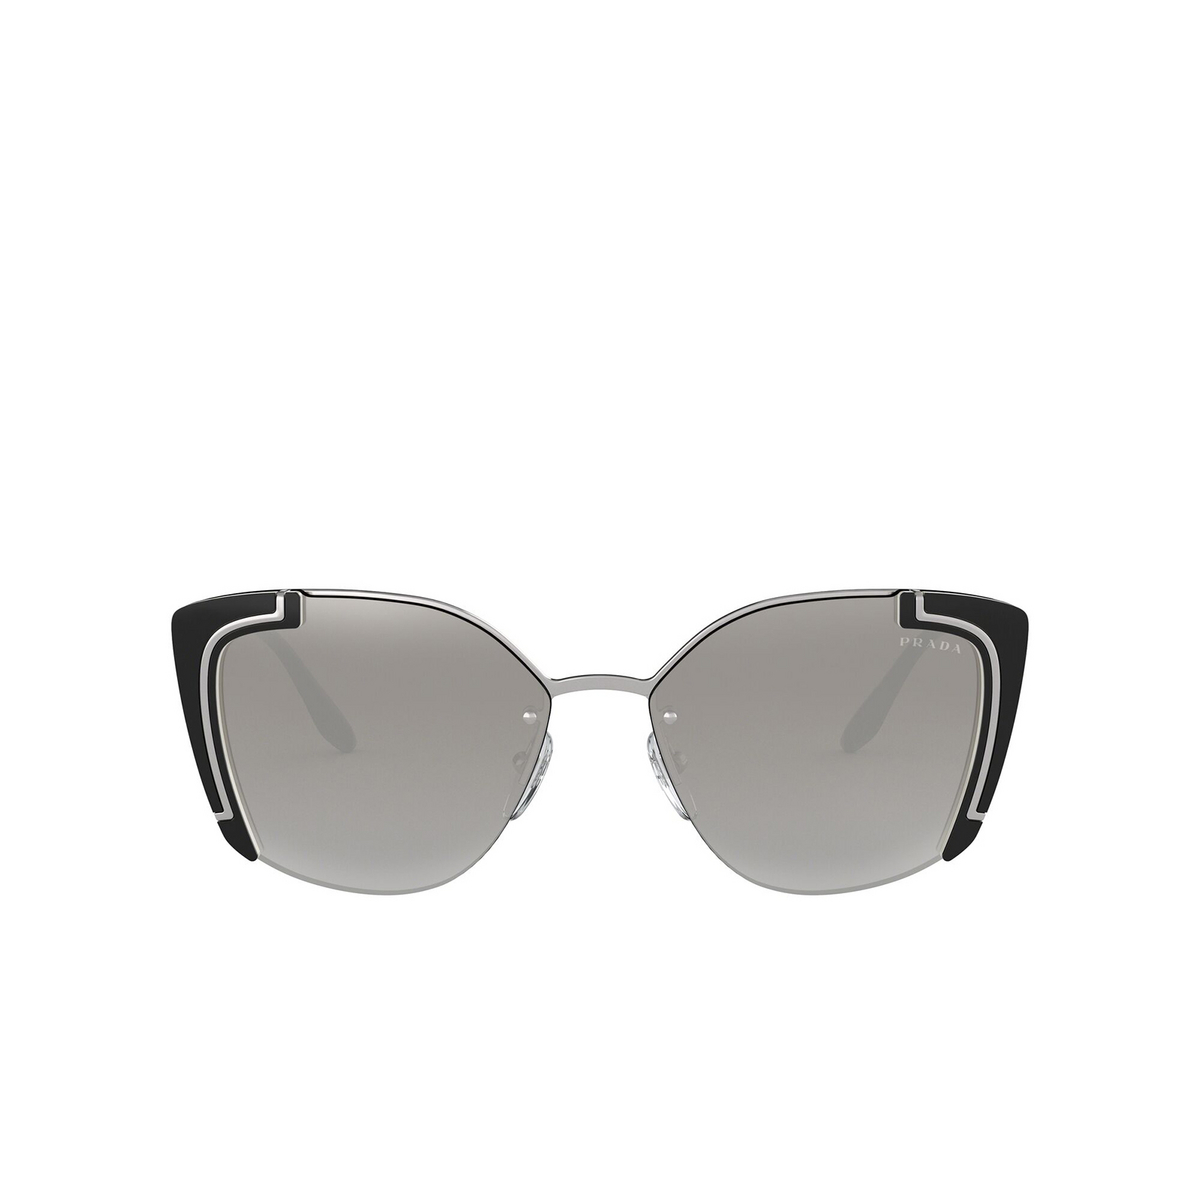 Prada® Butterfly Sunglasses: PR 59VS color Silver / Black Ivory 4315O0 - front view.